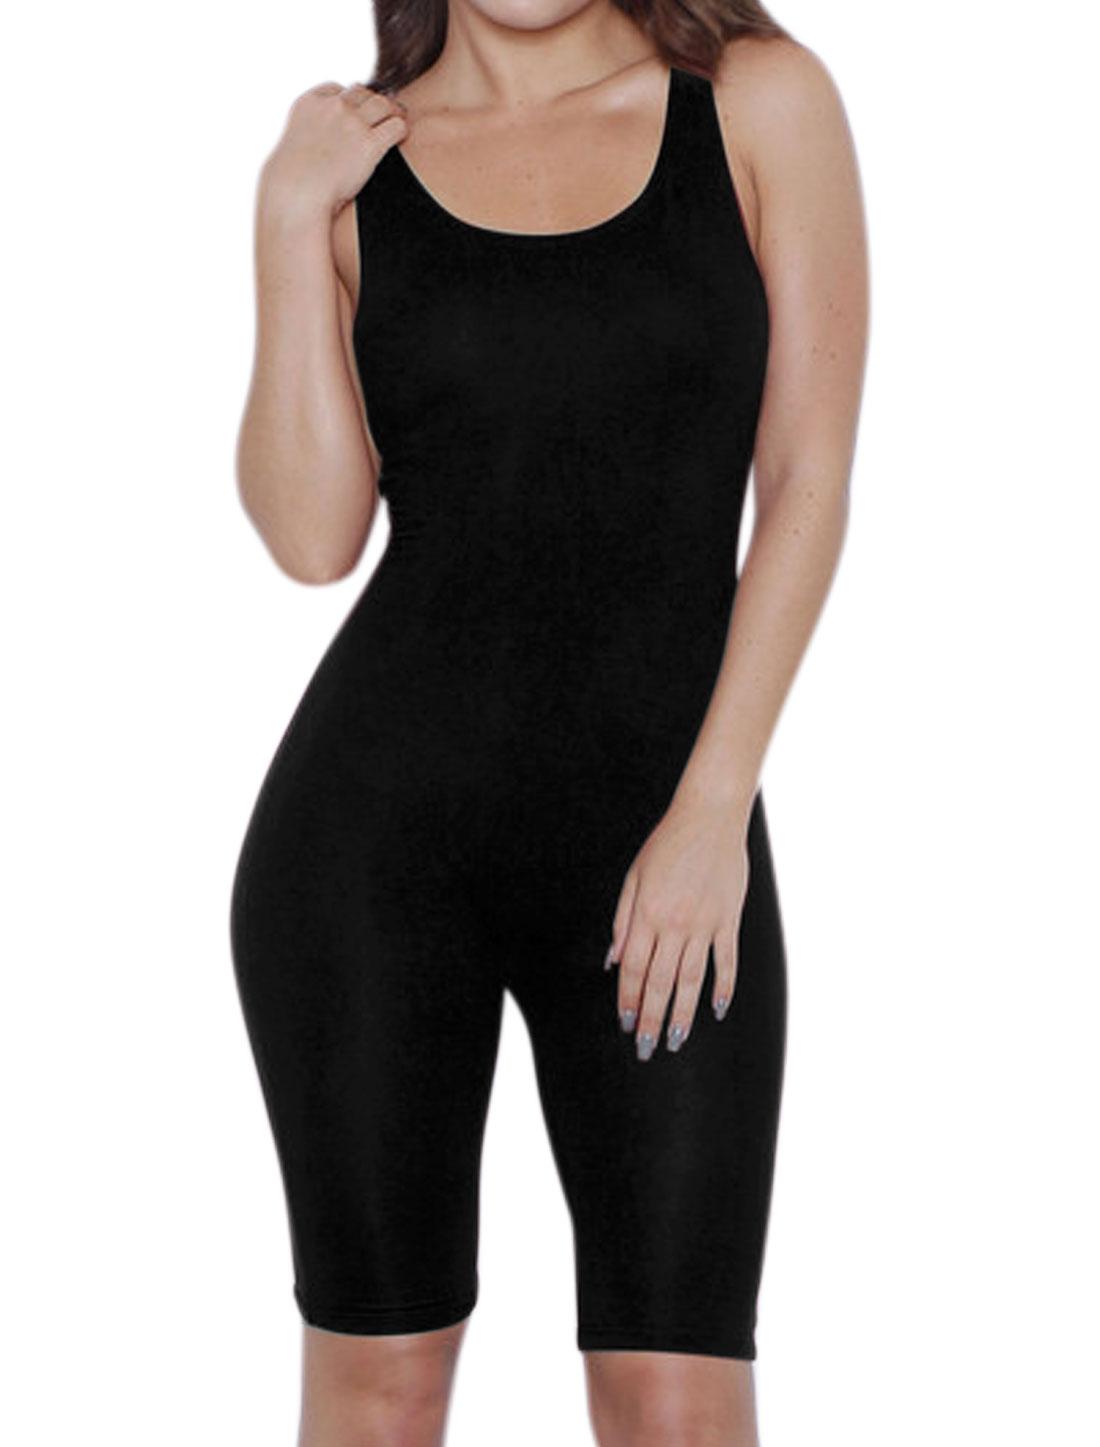 Women Scoop Neck Stretchy Knee Length Sport Romper Black L